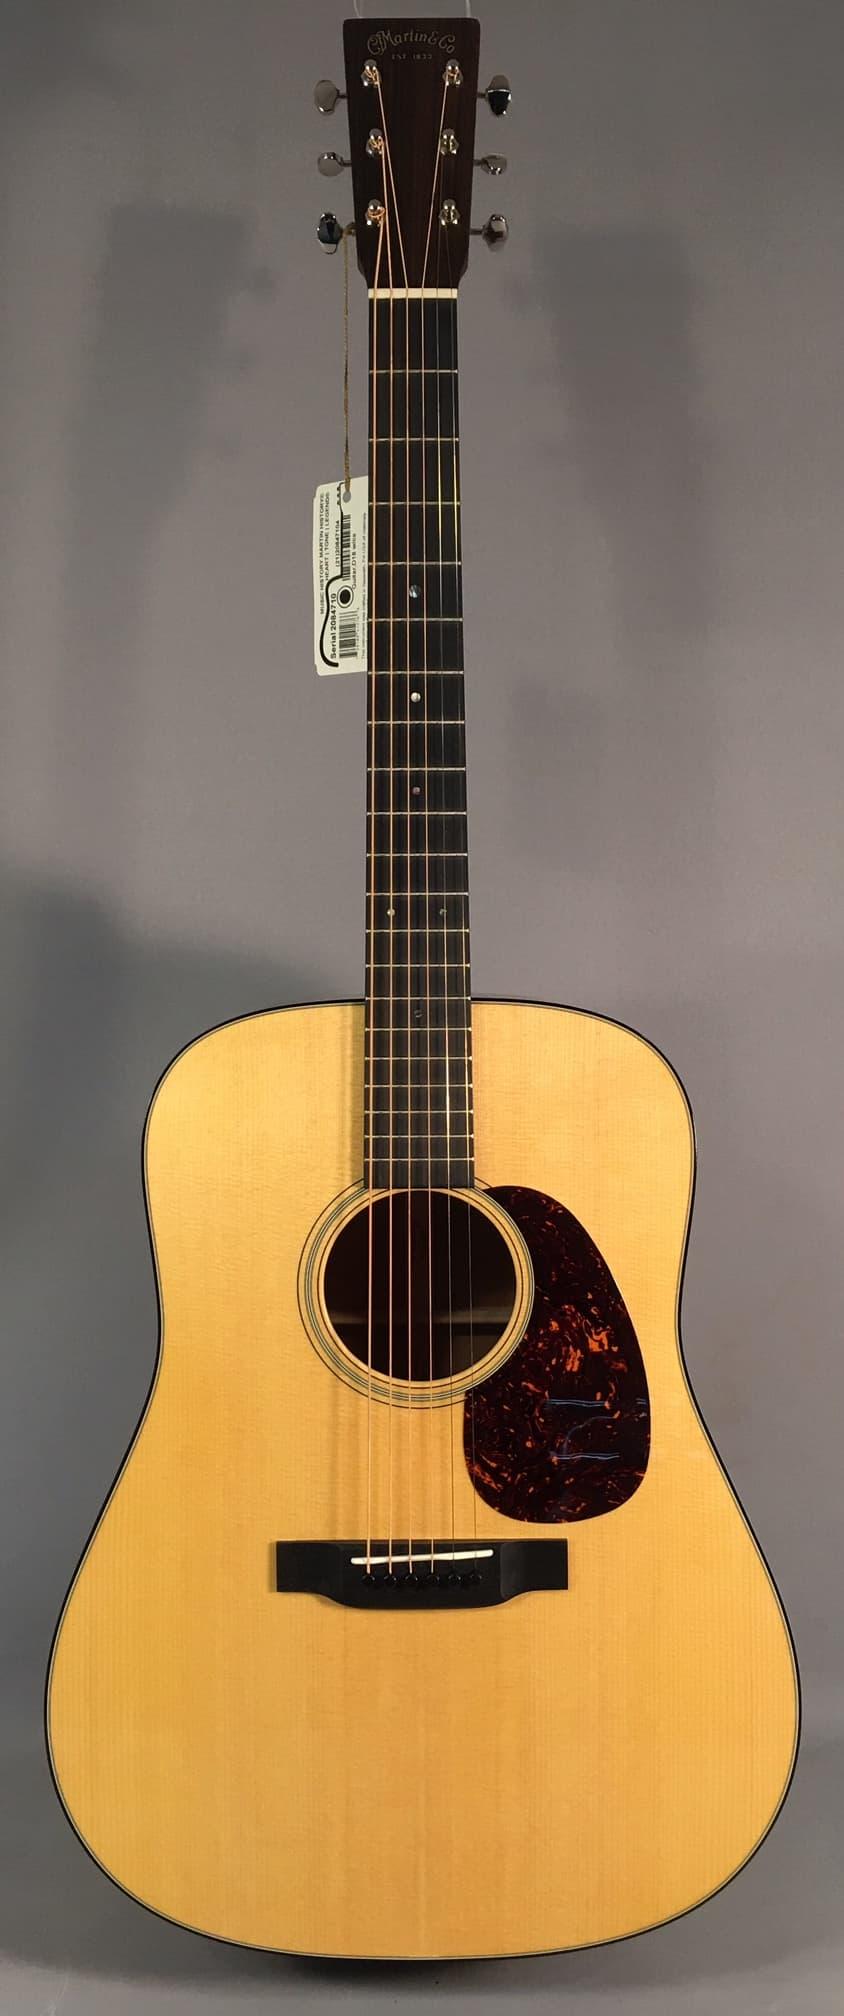 new martin d 18 acoustic guitar with case reverb. Black Bedroom Furniture Sets. Home Design Ideas